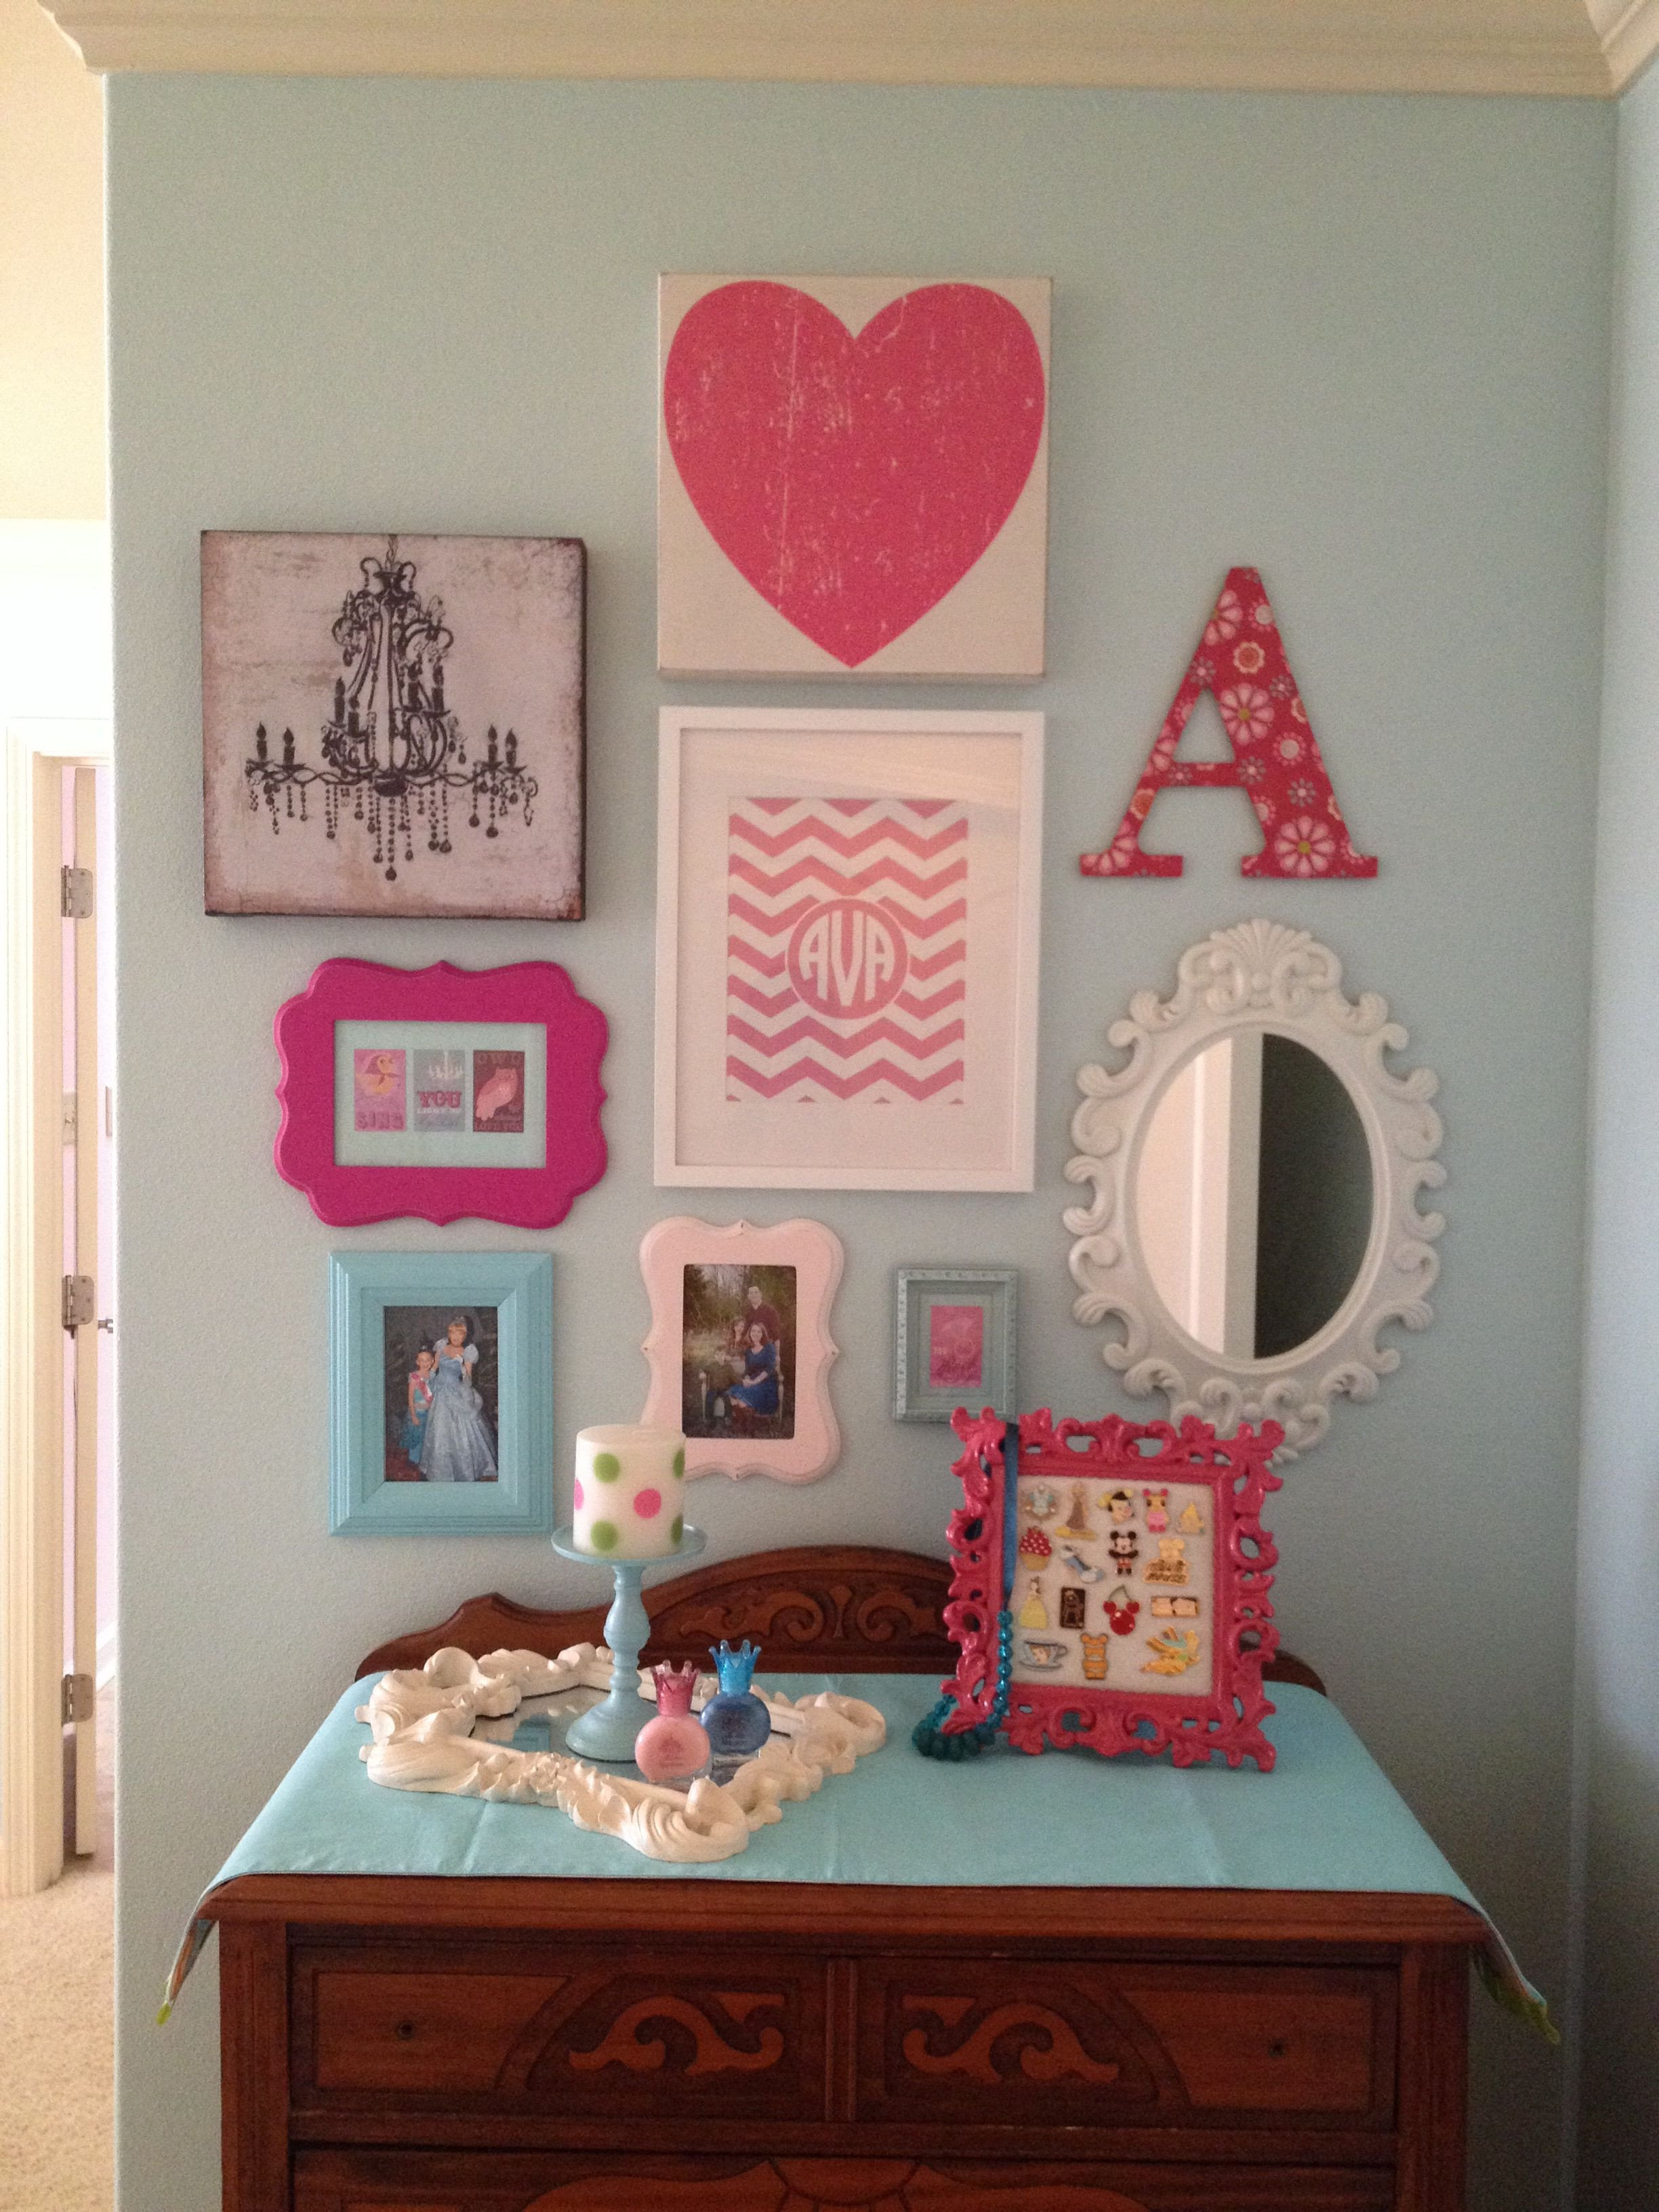 Little Mermaid Bedroom Decor Elegant Girls Room Gallery Wall